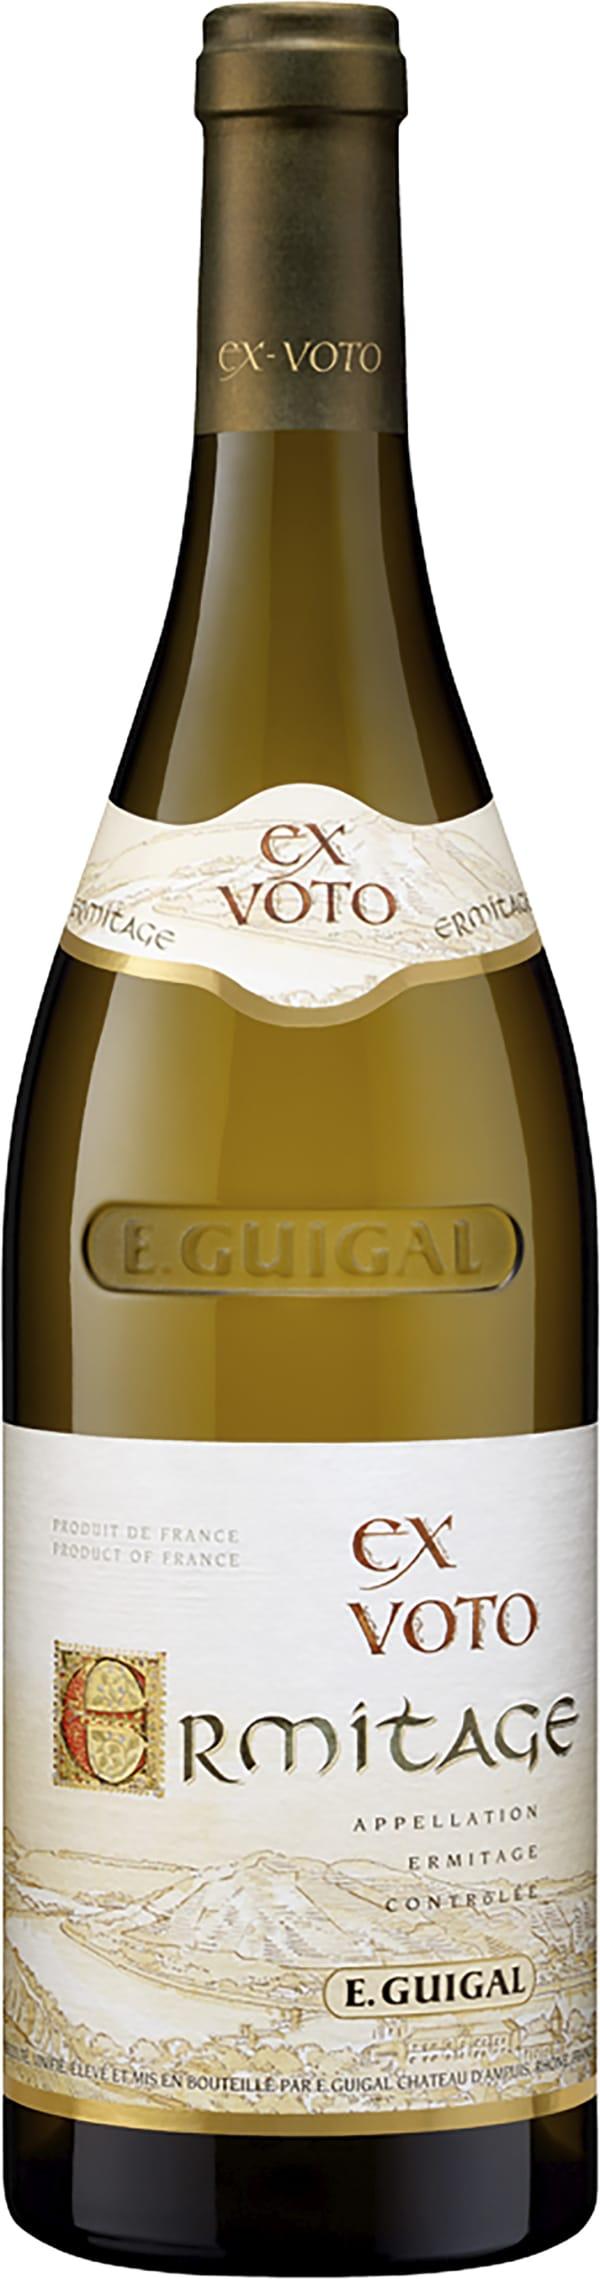 Guigal Ex Voto Ermitage Blanc 2017